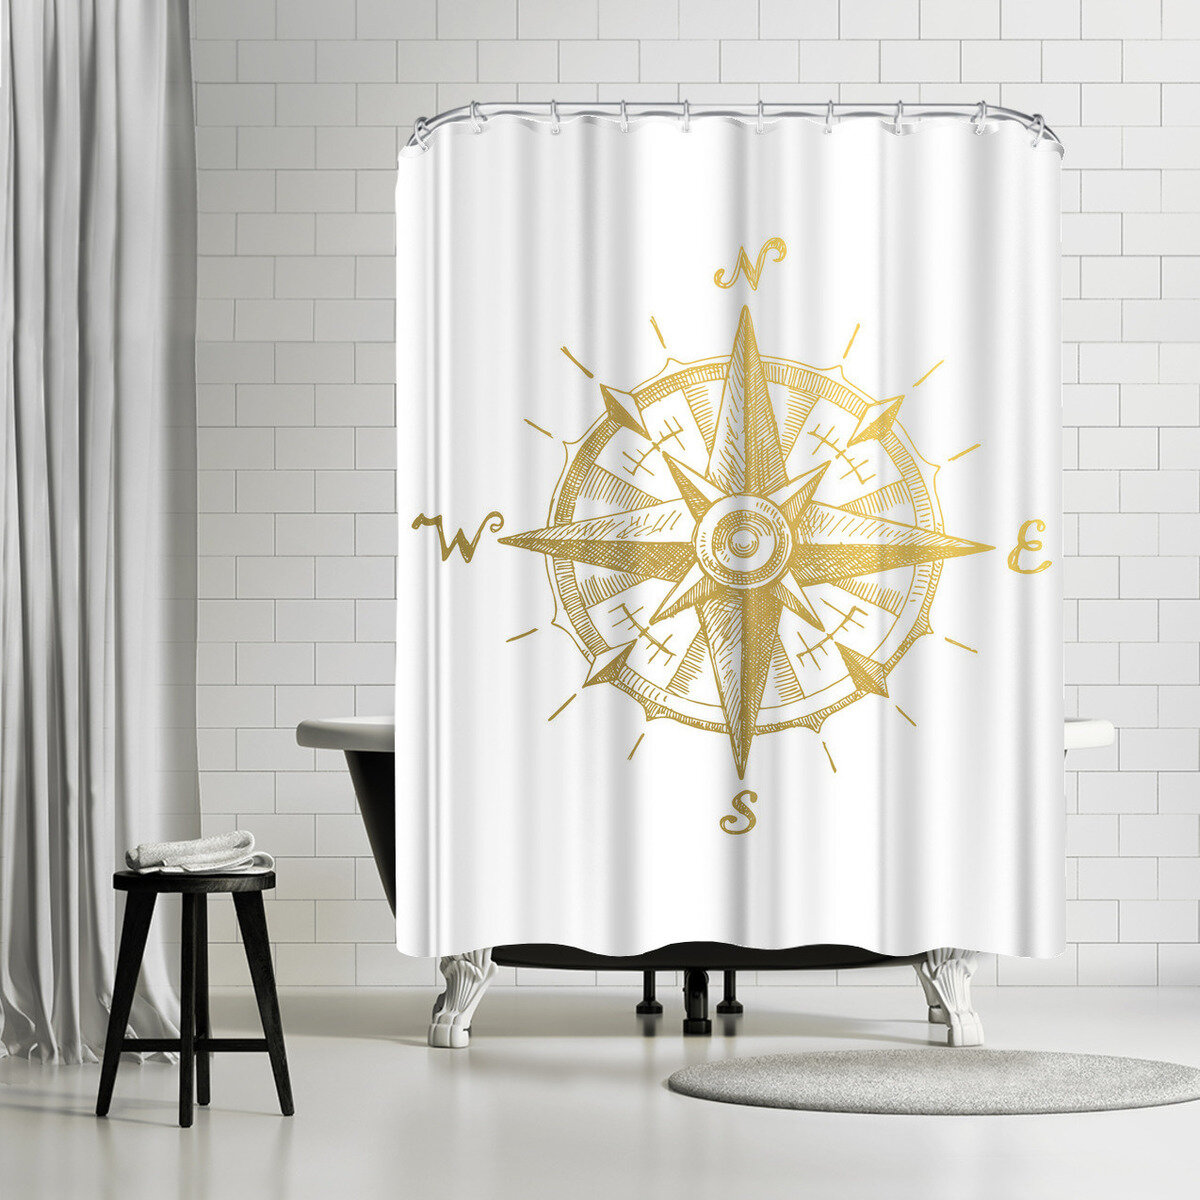 East Urban Home Adams Ale Gold Foil Compass Shower Curtain